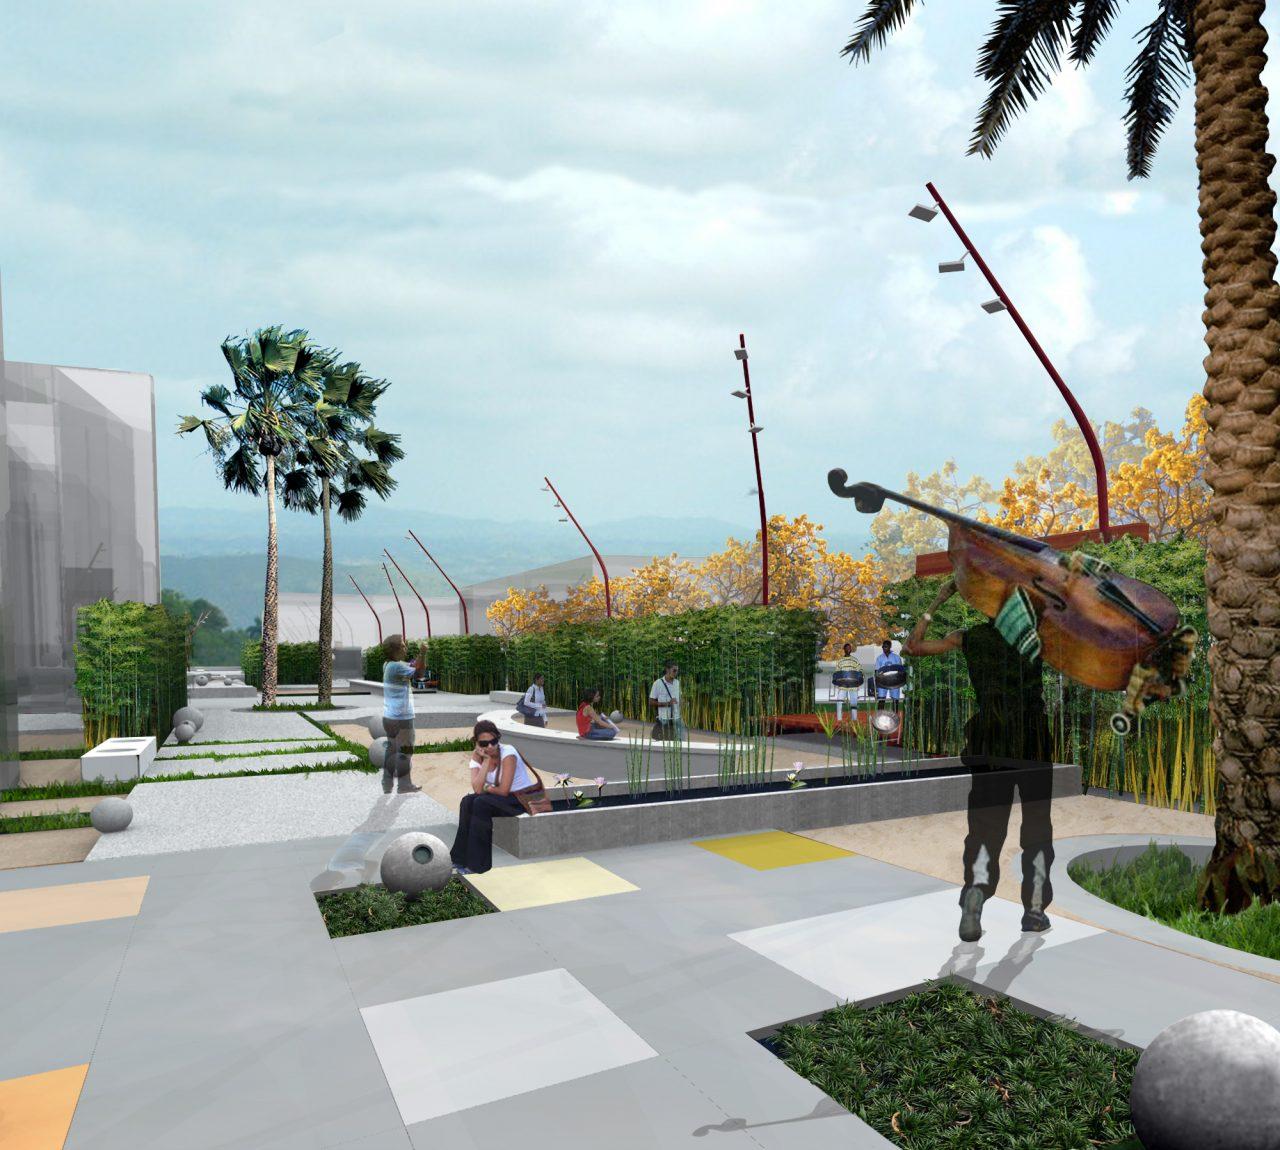 collage of sidewalk design proposal in trinidad